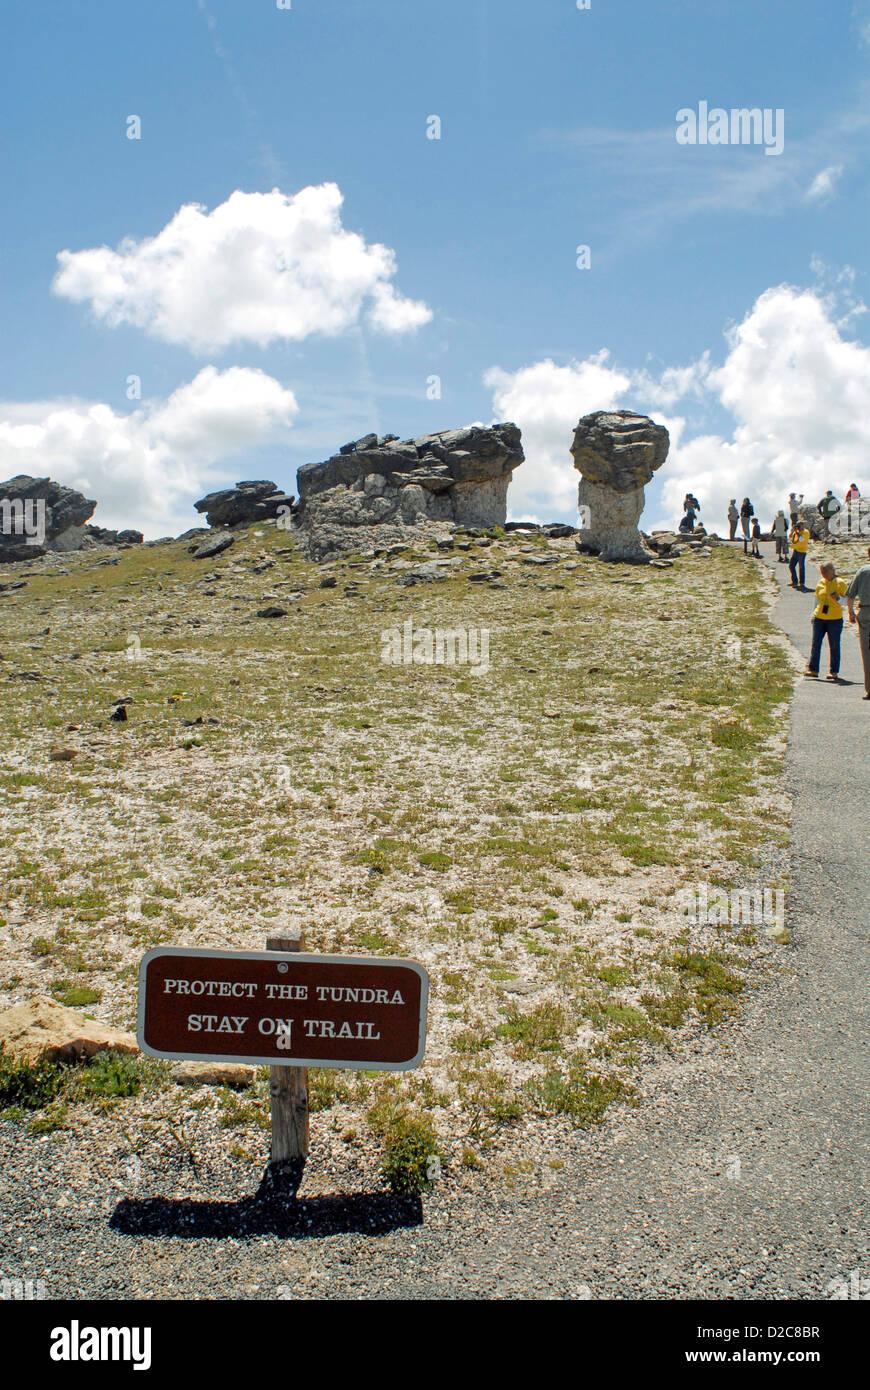 Tundra Communities Trailhead, Hiking Trail, Rocky Mt. National Park, Colorado Stock Photo